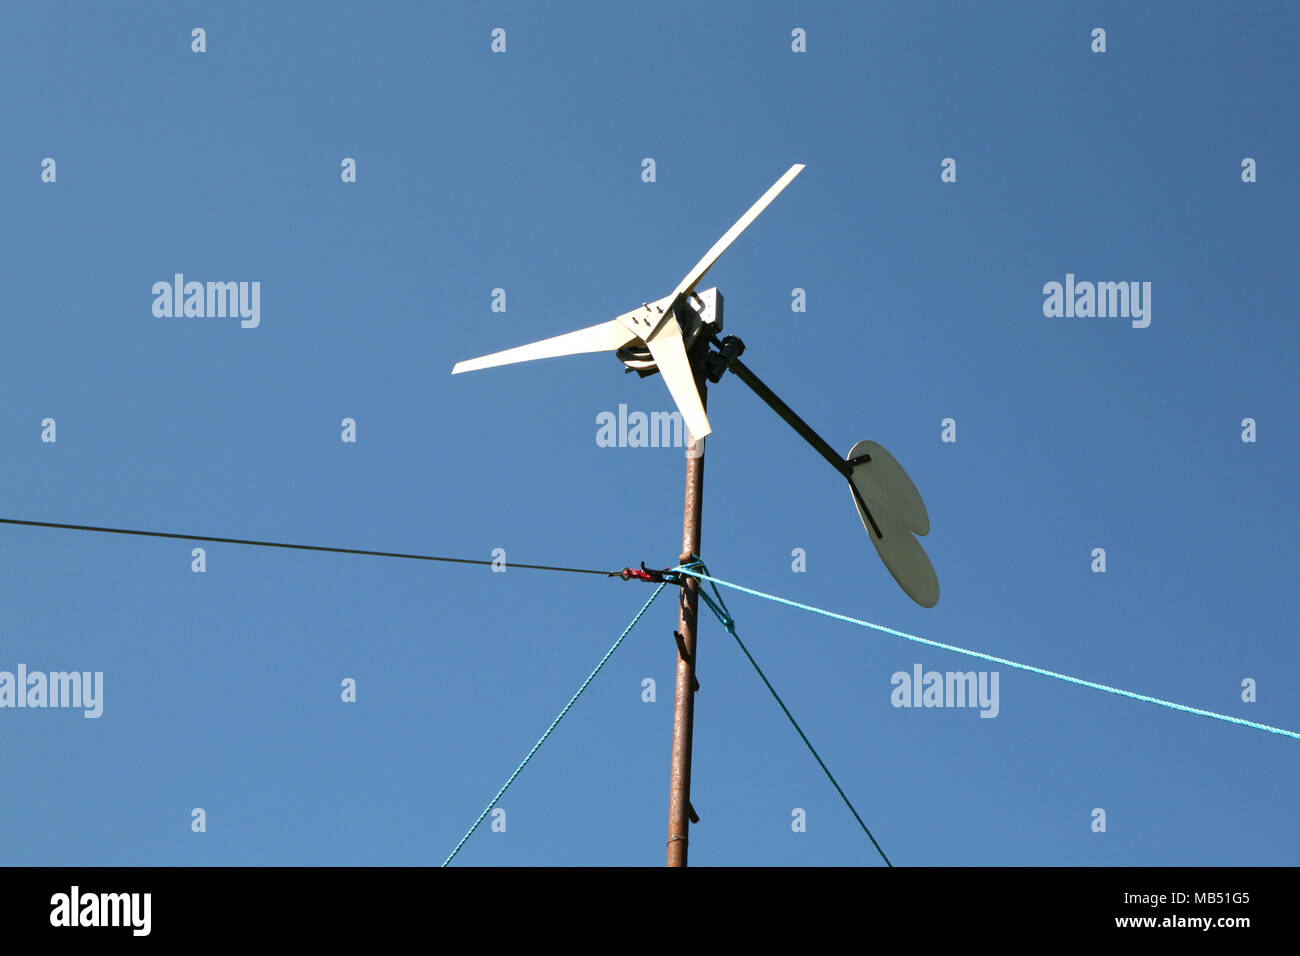 Small wind turbine clean energy production selfbuilt - Stock Image